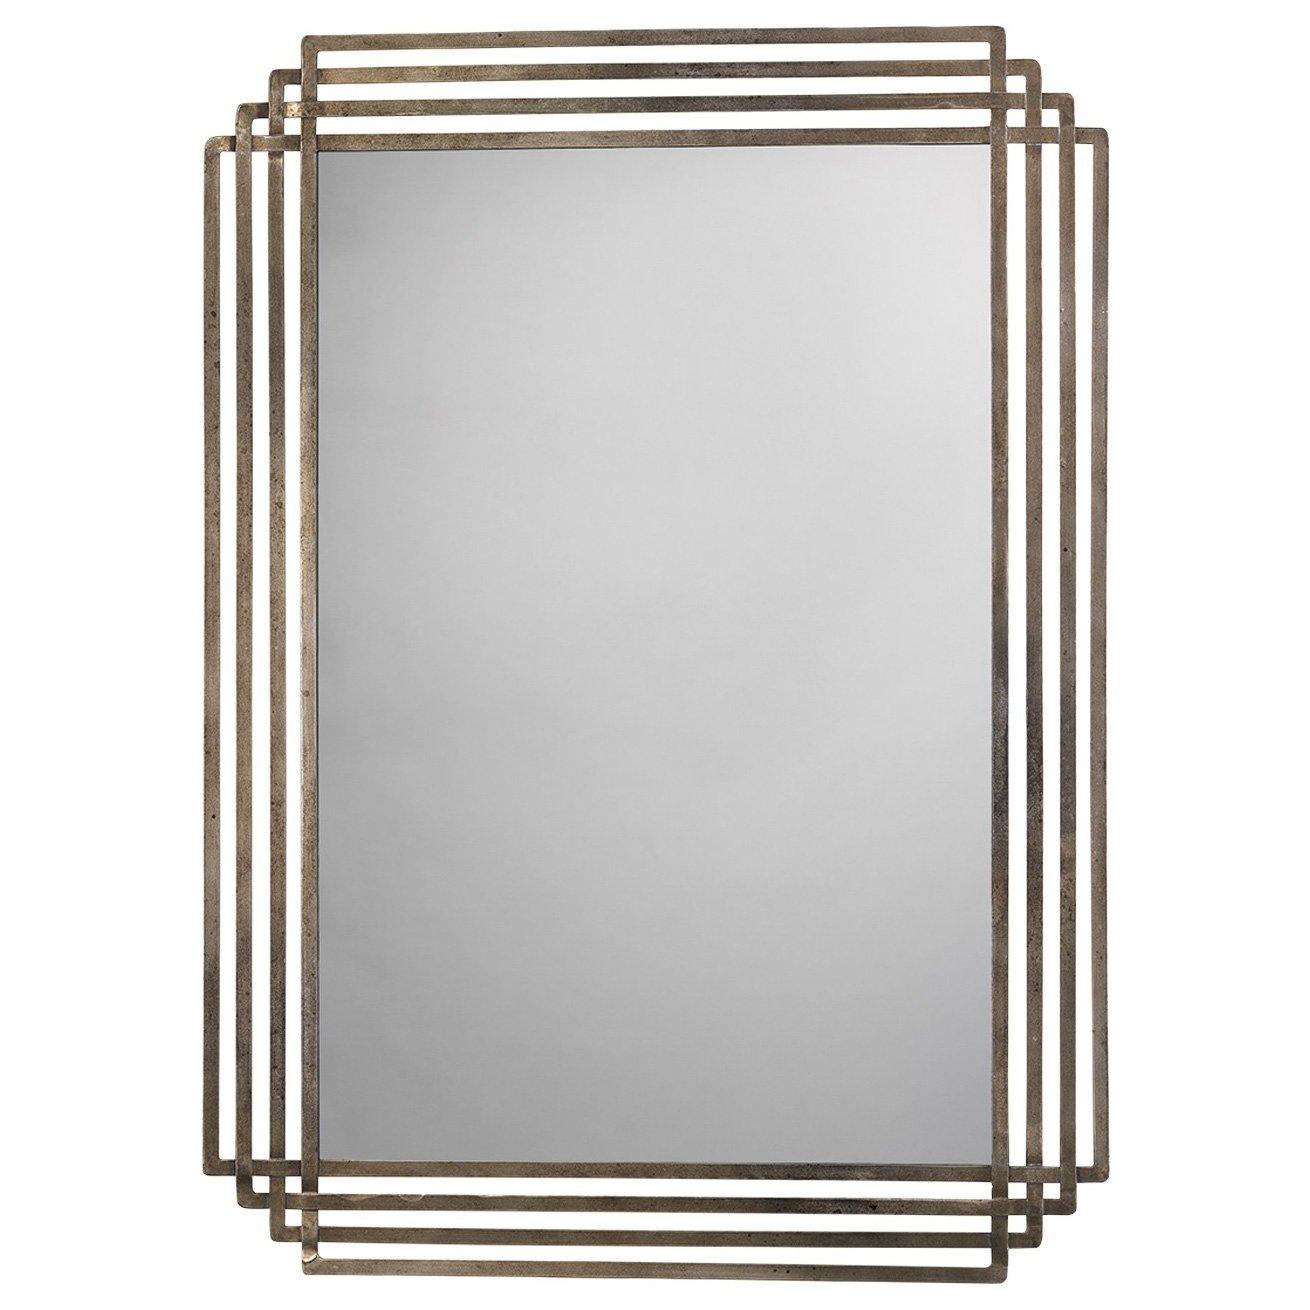 Jamie Young Serai Wall Mirror Big Wall Mirrors Lighted